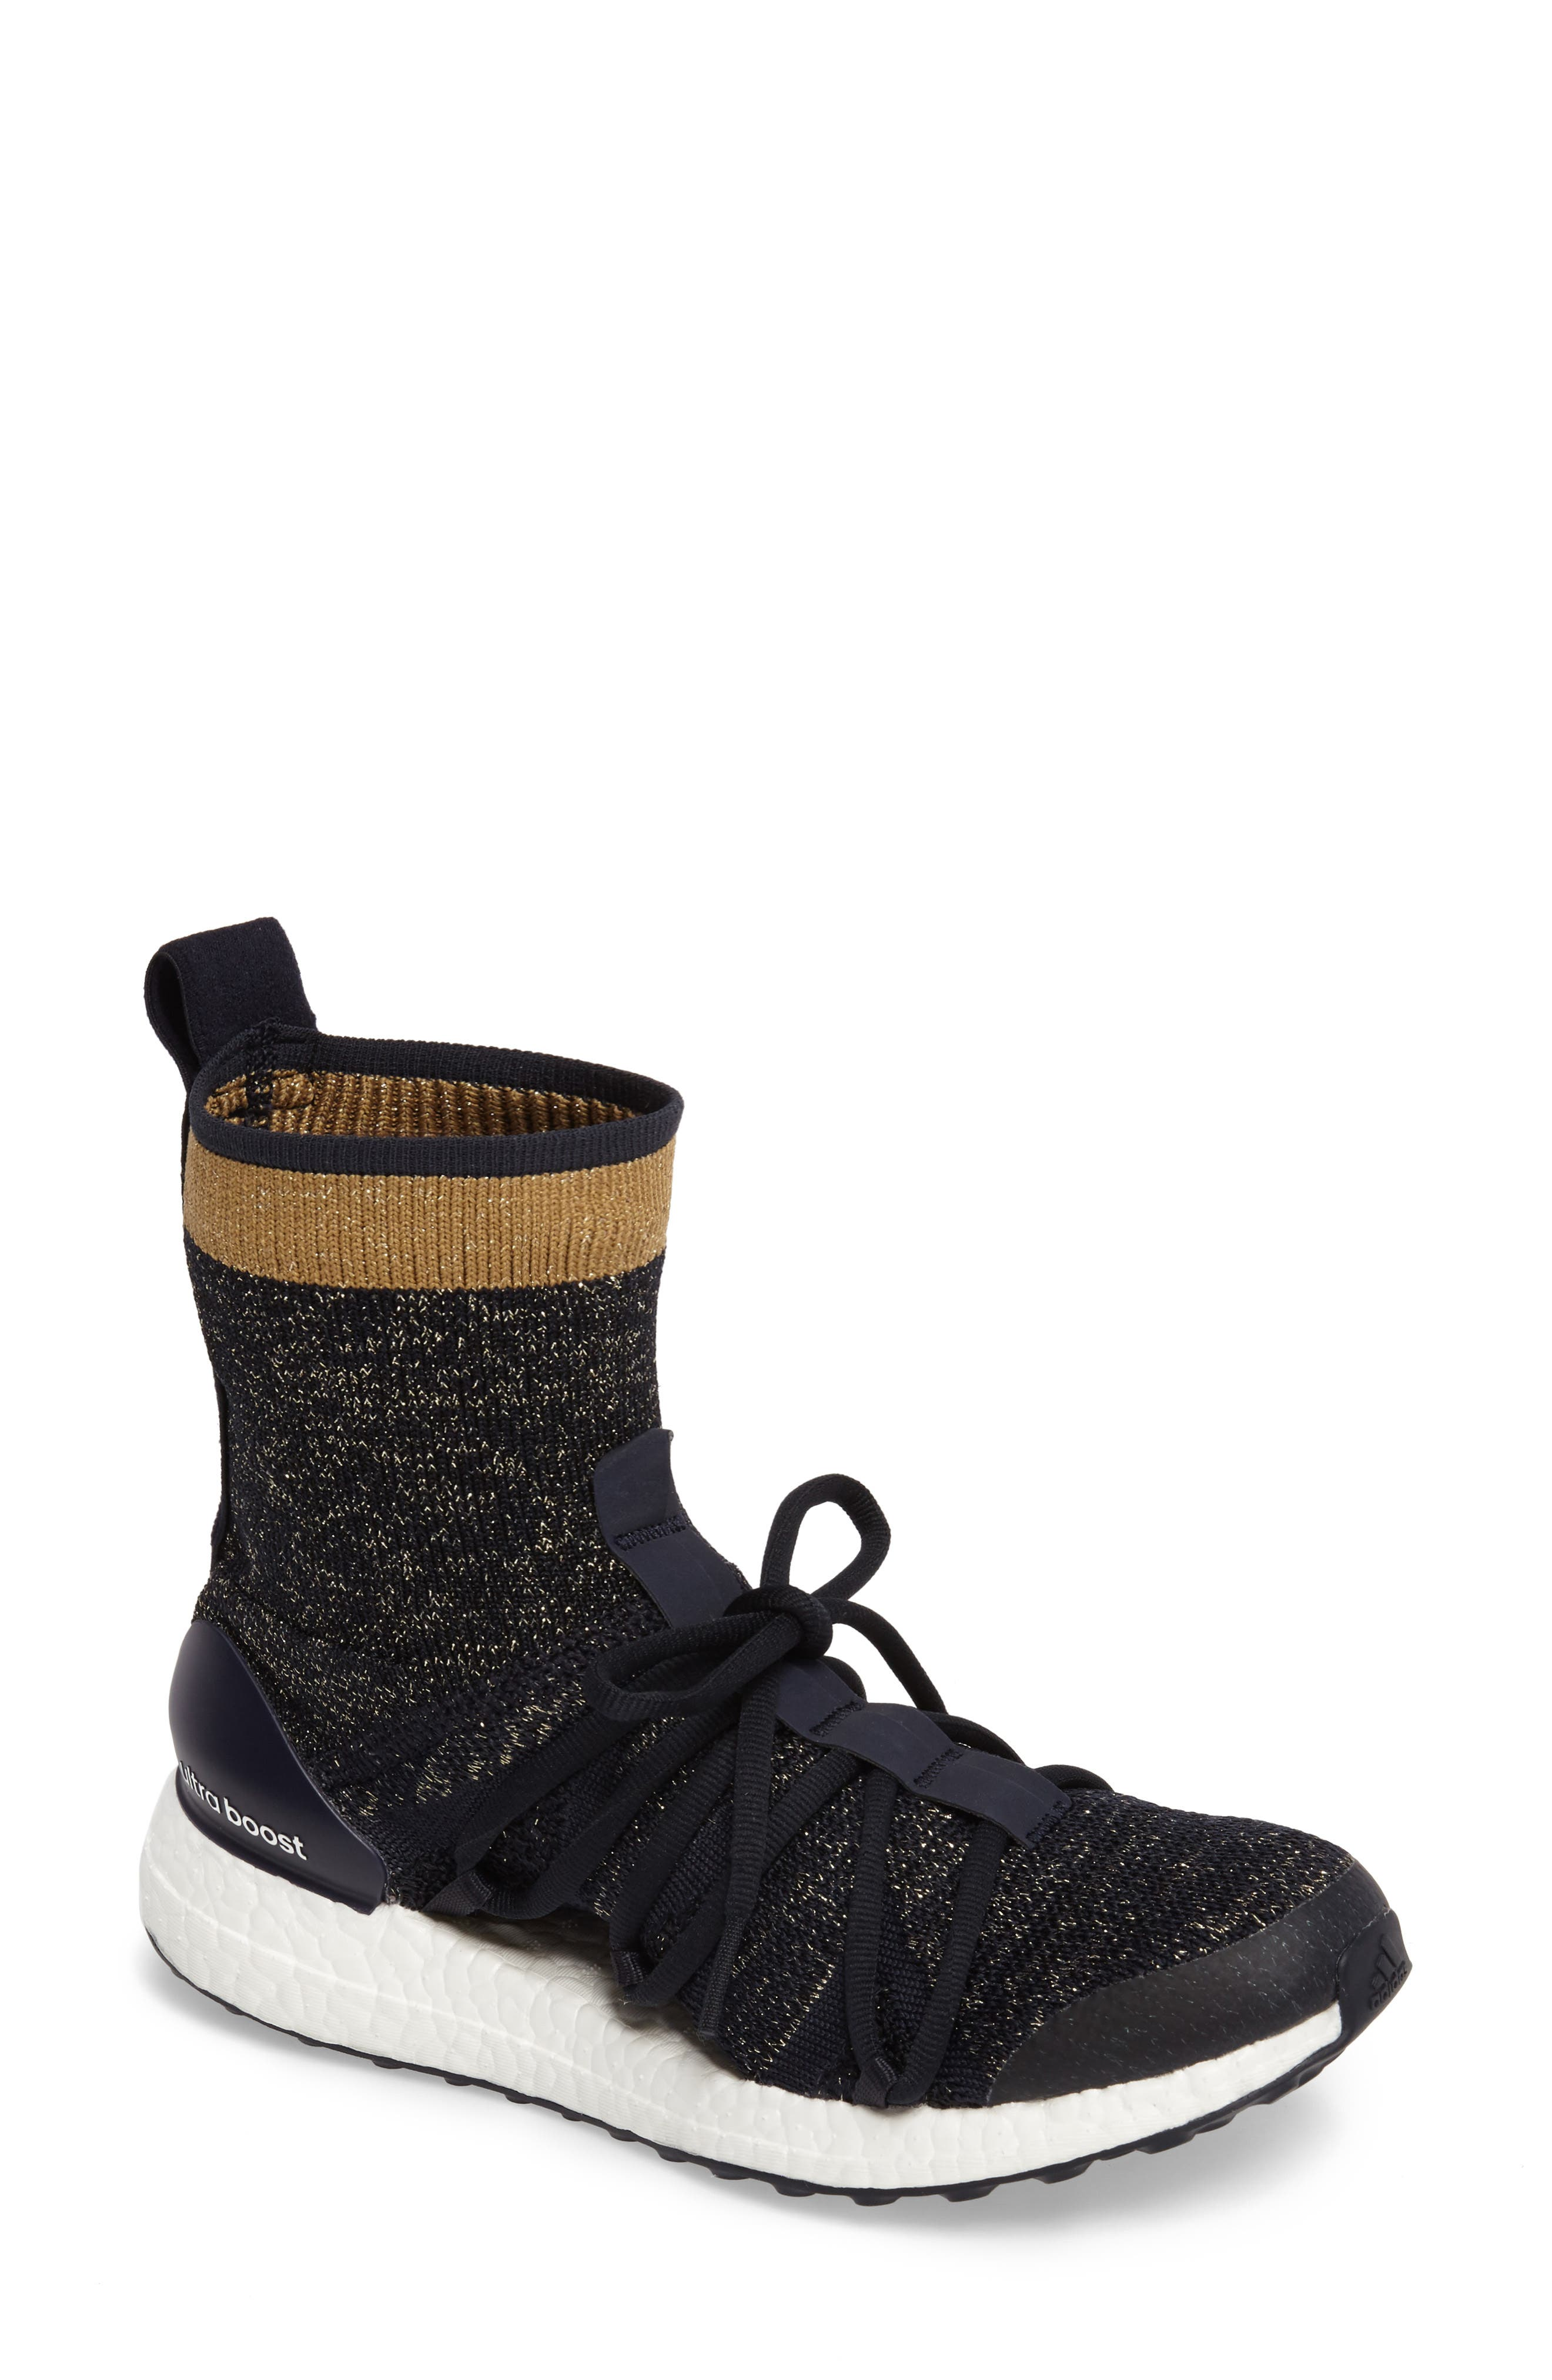 Adidas Ultraboost X Mid Womens Sneakers Trainers Stella Mccartney Primeknit